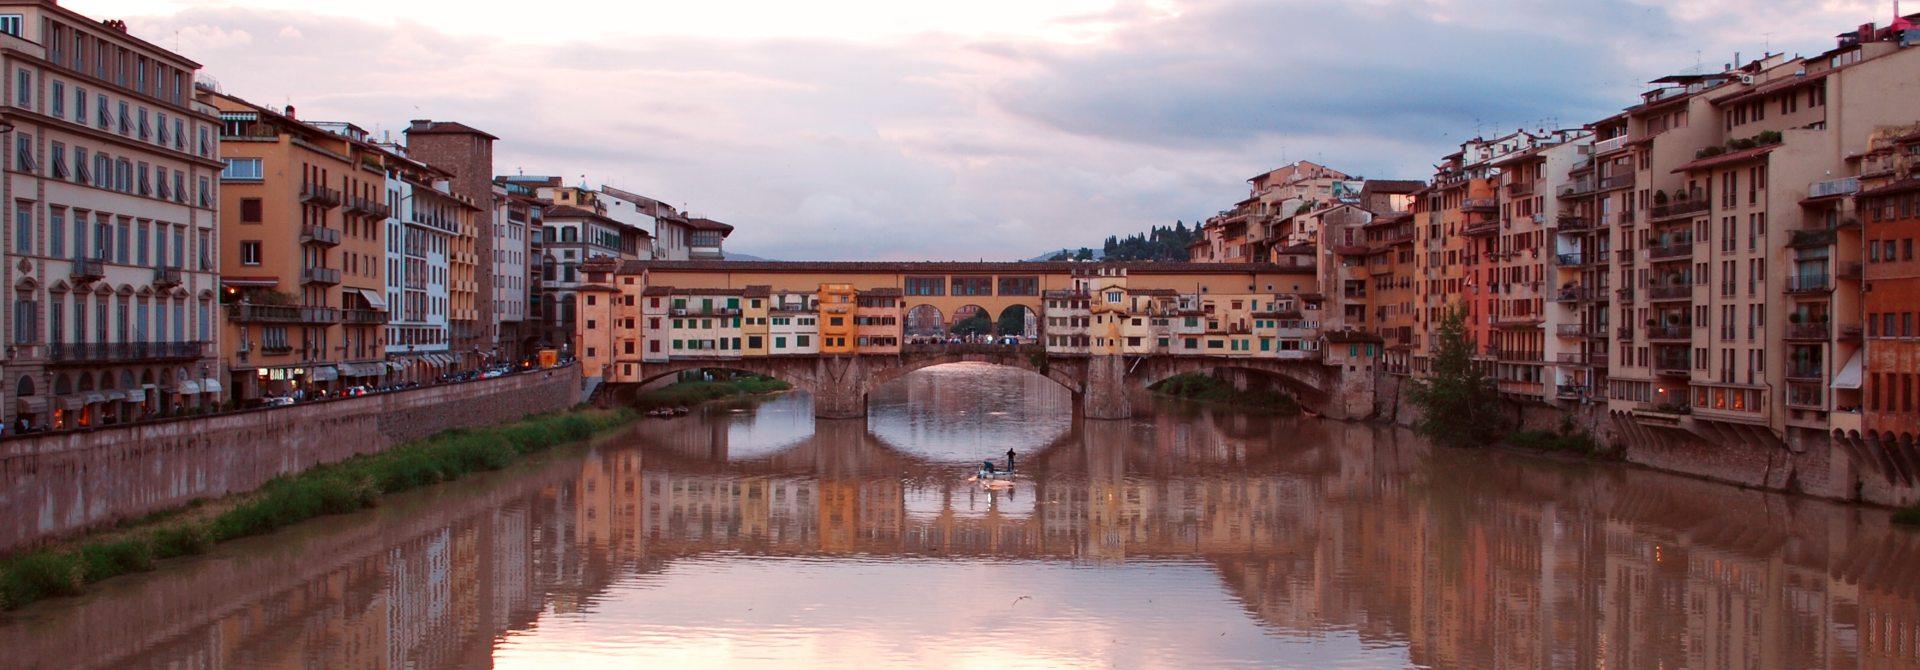 Ponte Vecchio Header